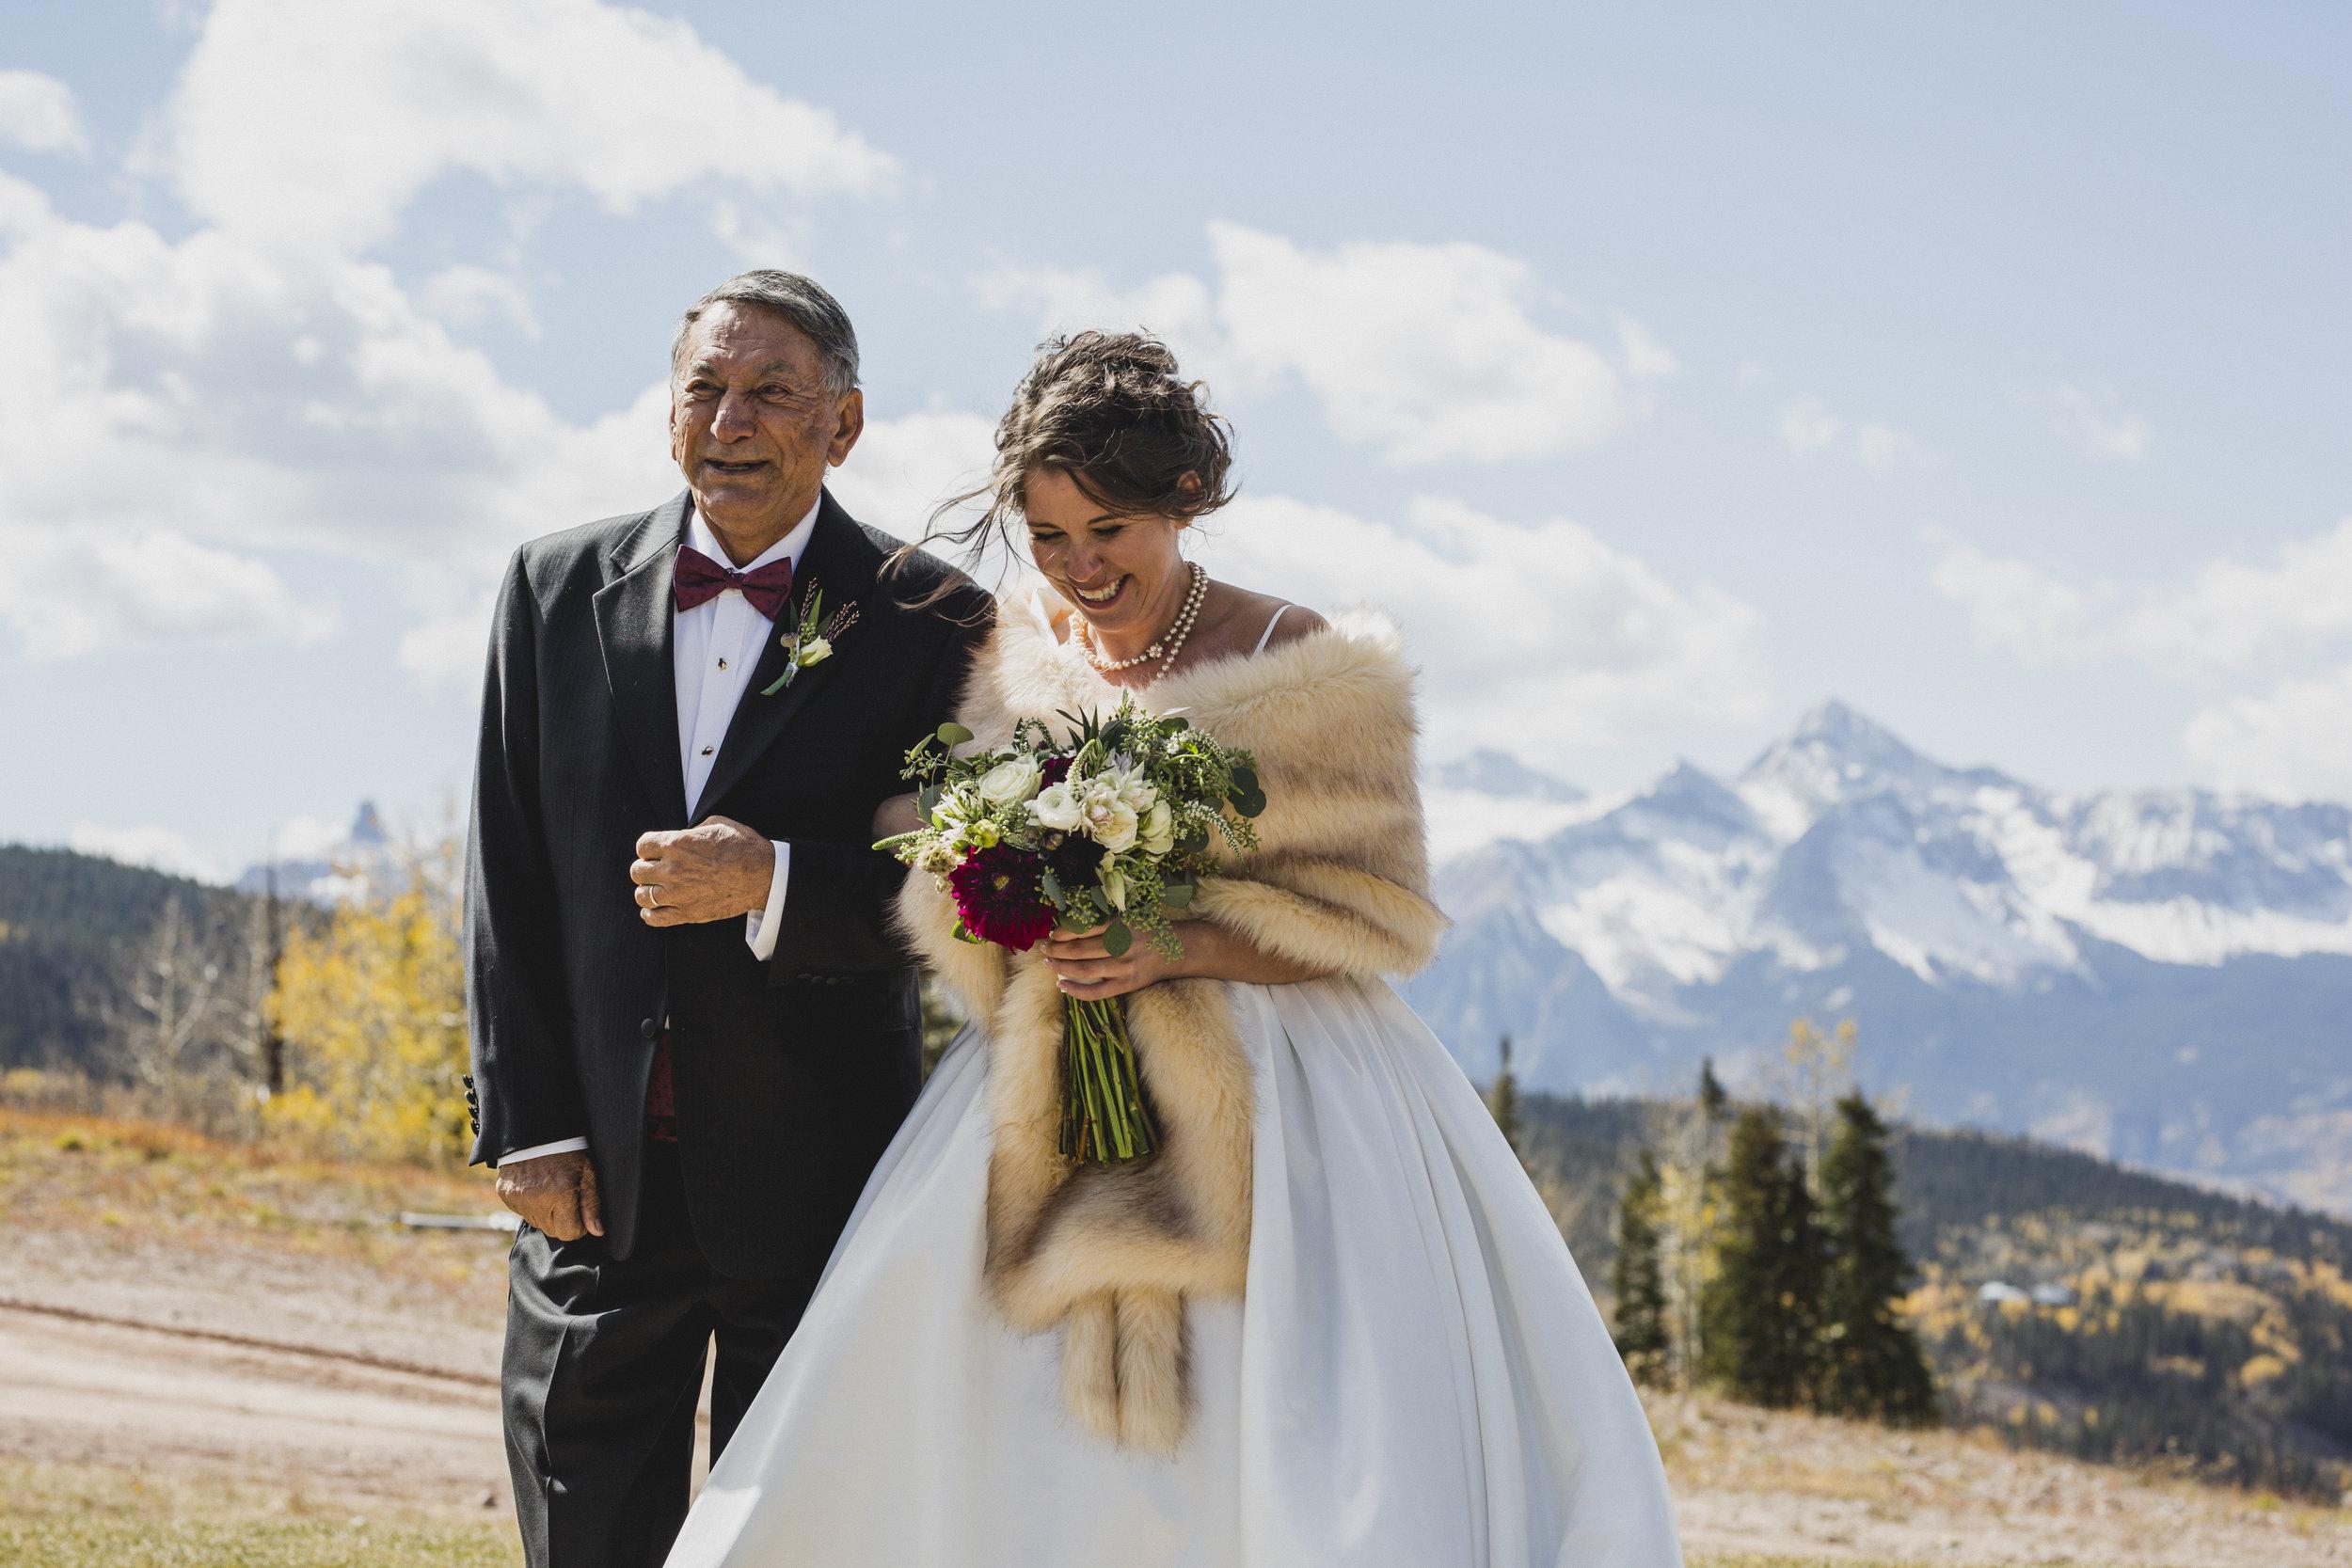 NE-LeahandAshtonphotography-Telluride-Wedding-Photography-9291.jpg